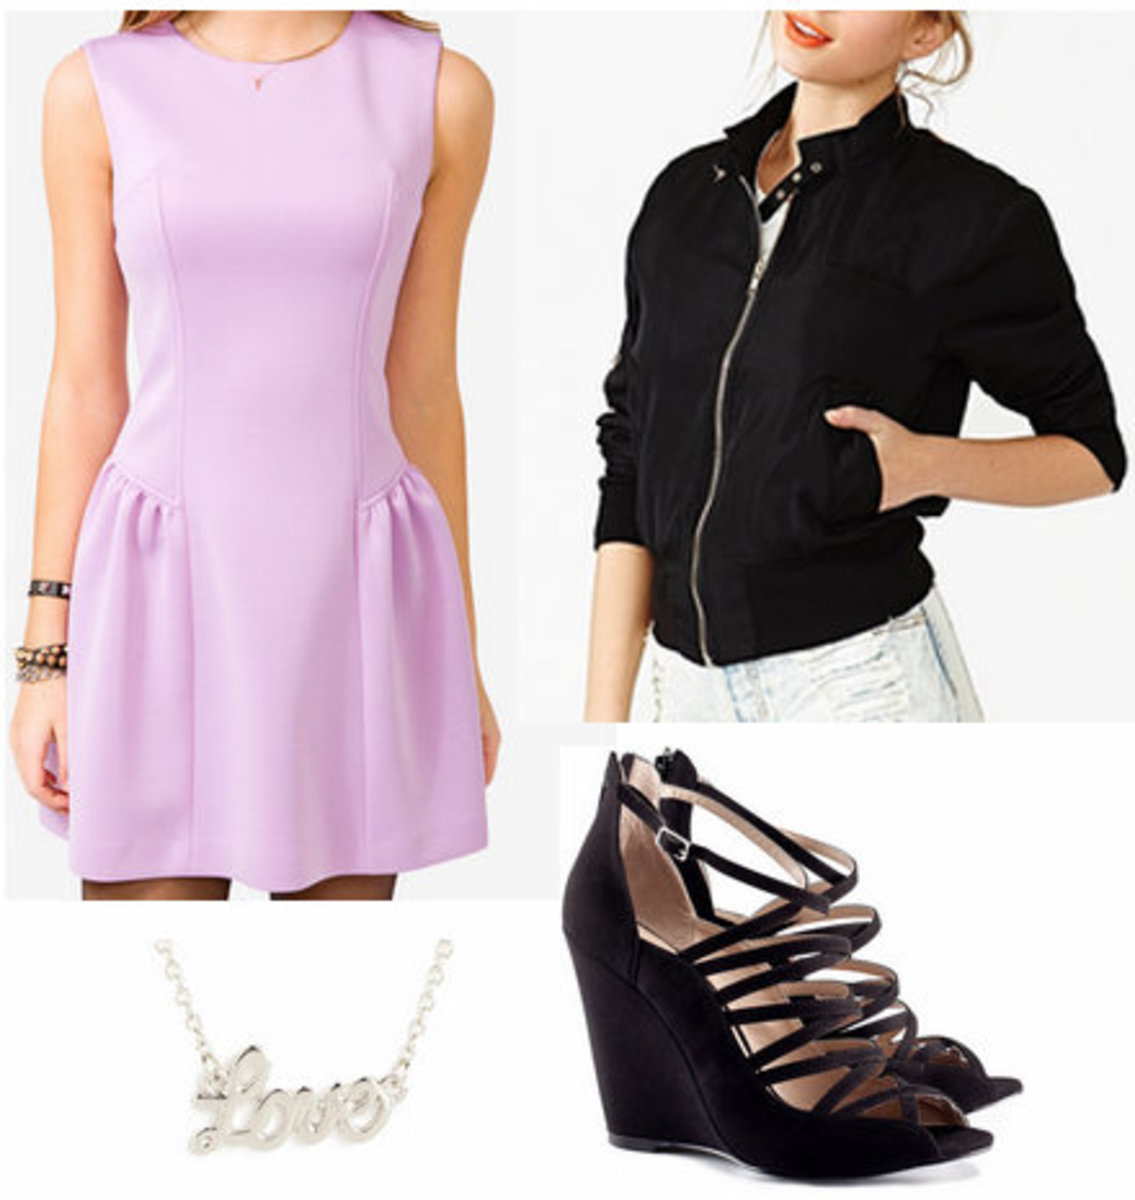 purple-light-dress-lavender-black-jacket-bomber-black-shoe-sandalw-necklace-howtowear-fashion-style-outfit-spring-summer-dinner.jpg